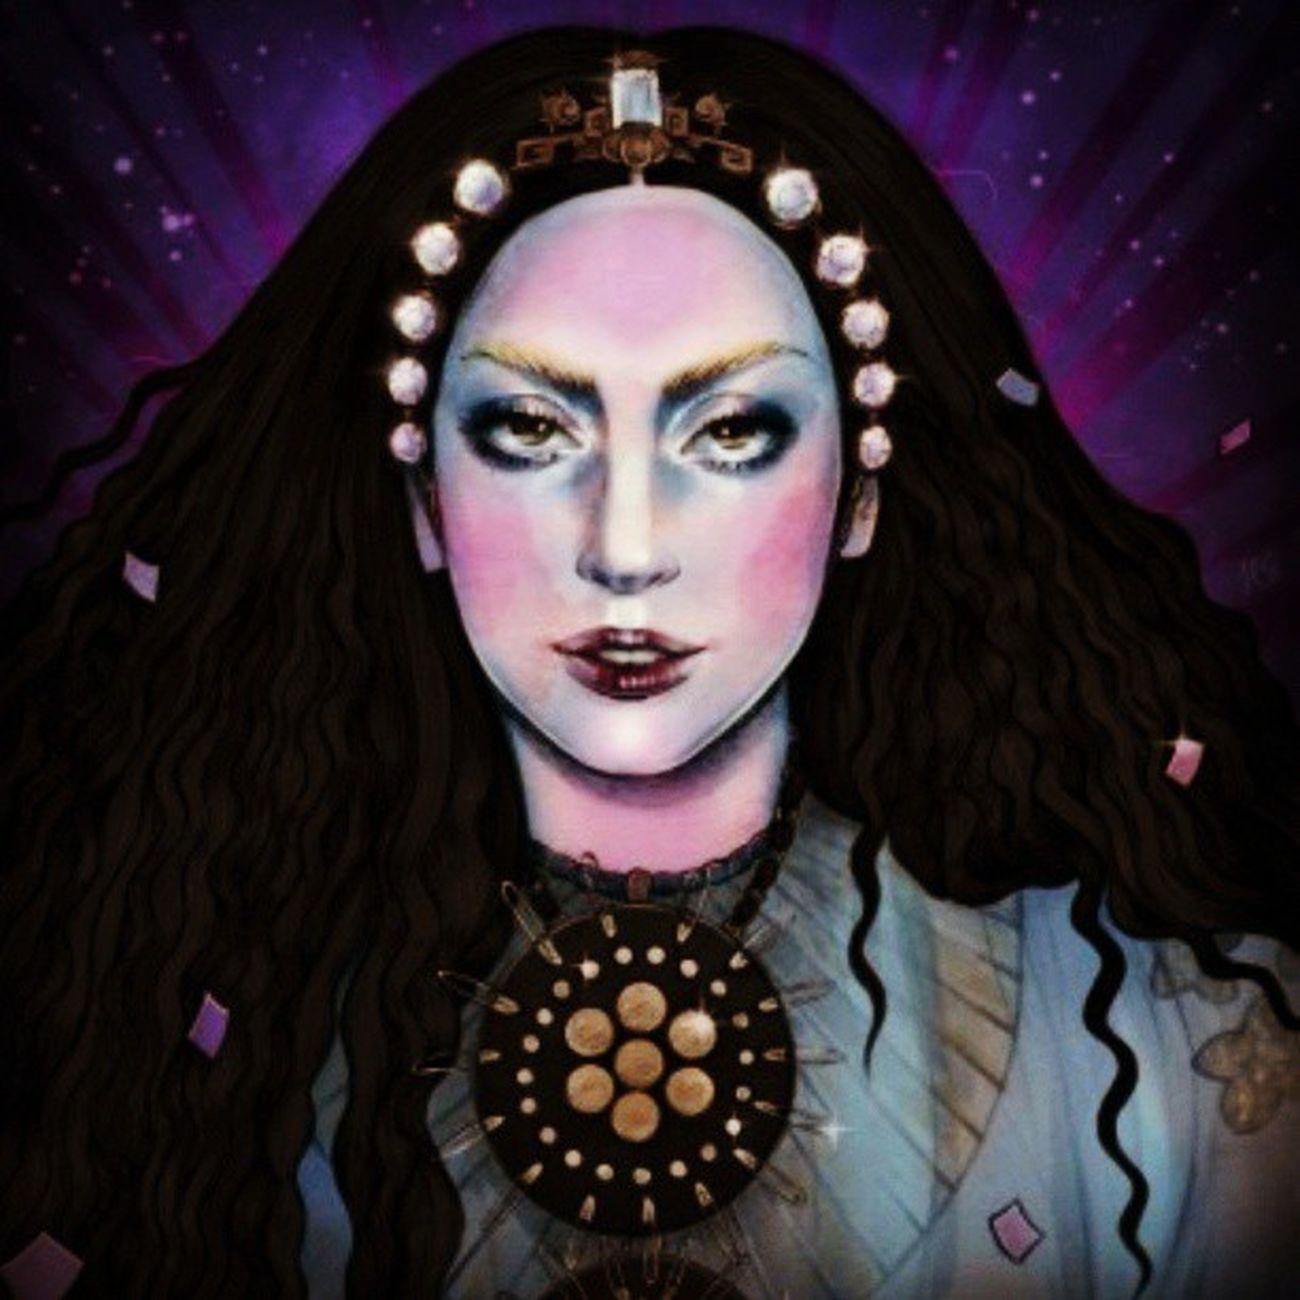 gaga galiano pic by hellen green<3 Ladygaga Drawing Gaga From  Applause hellengreen art pop culture